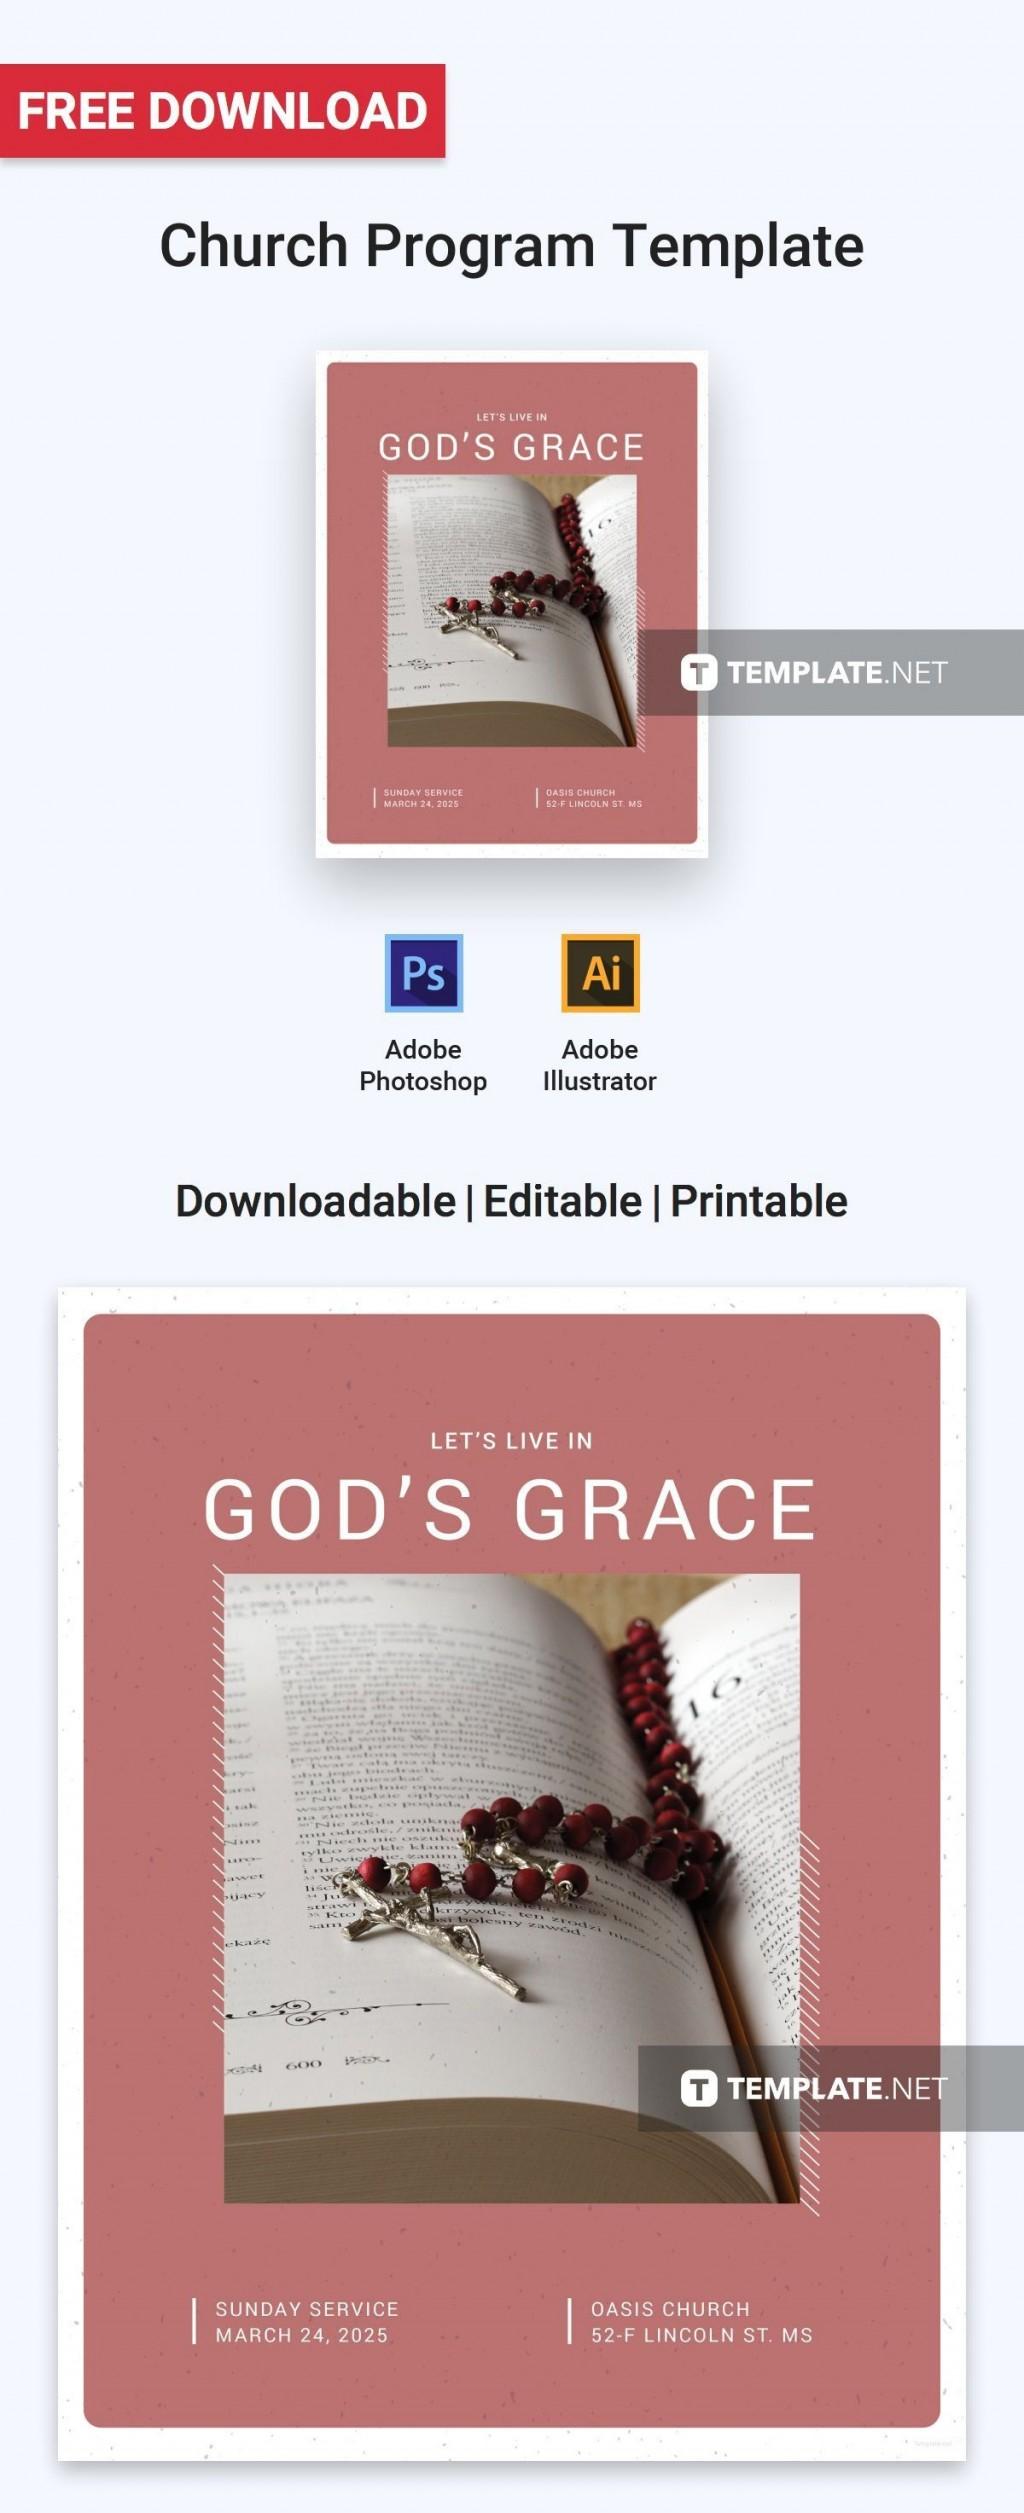 000 Surprising Free Church Program Template Download Design  DownloadsLarge